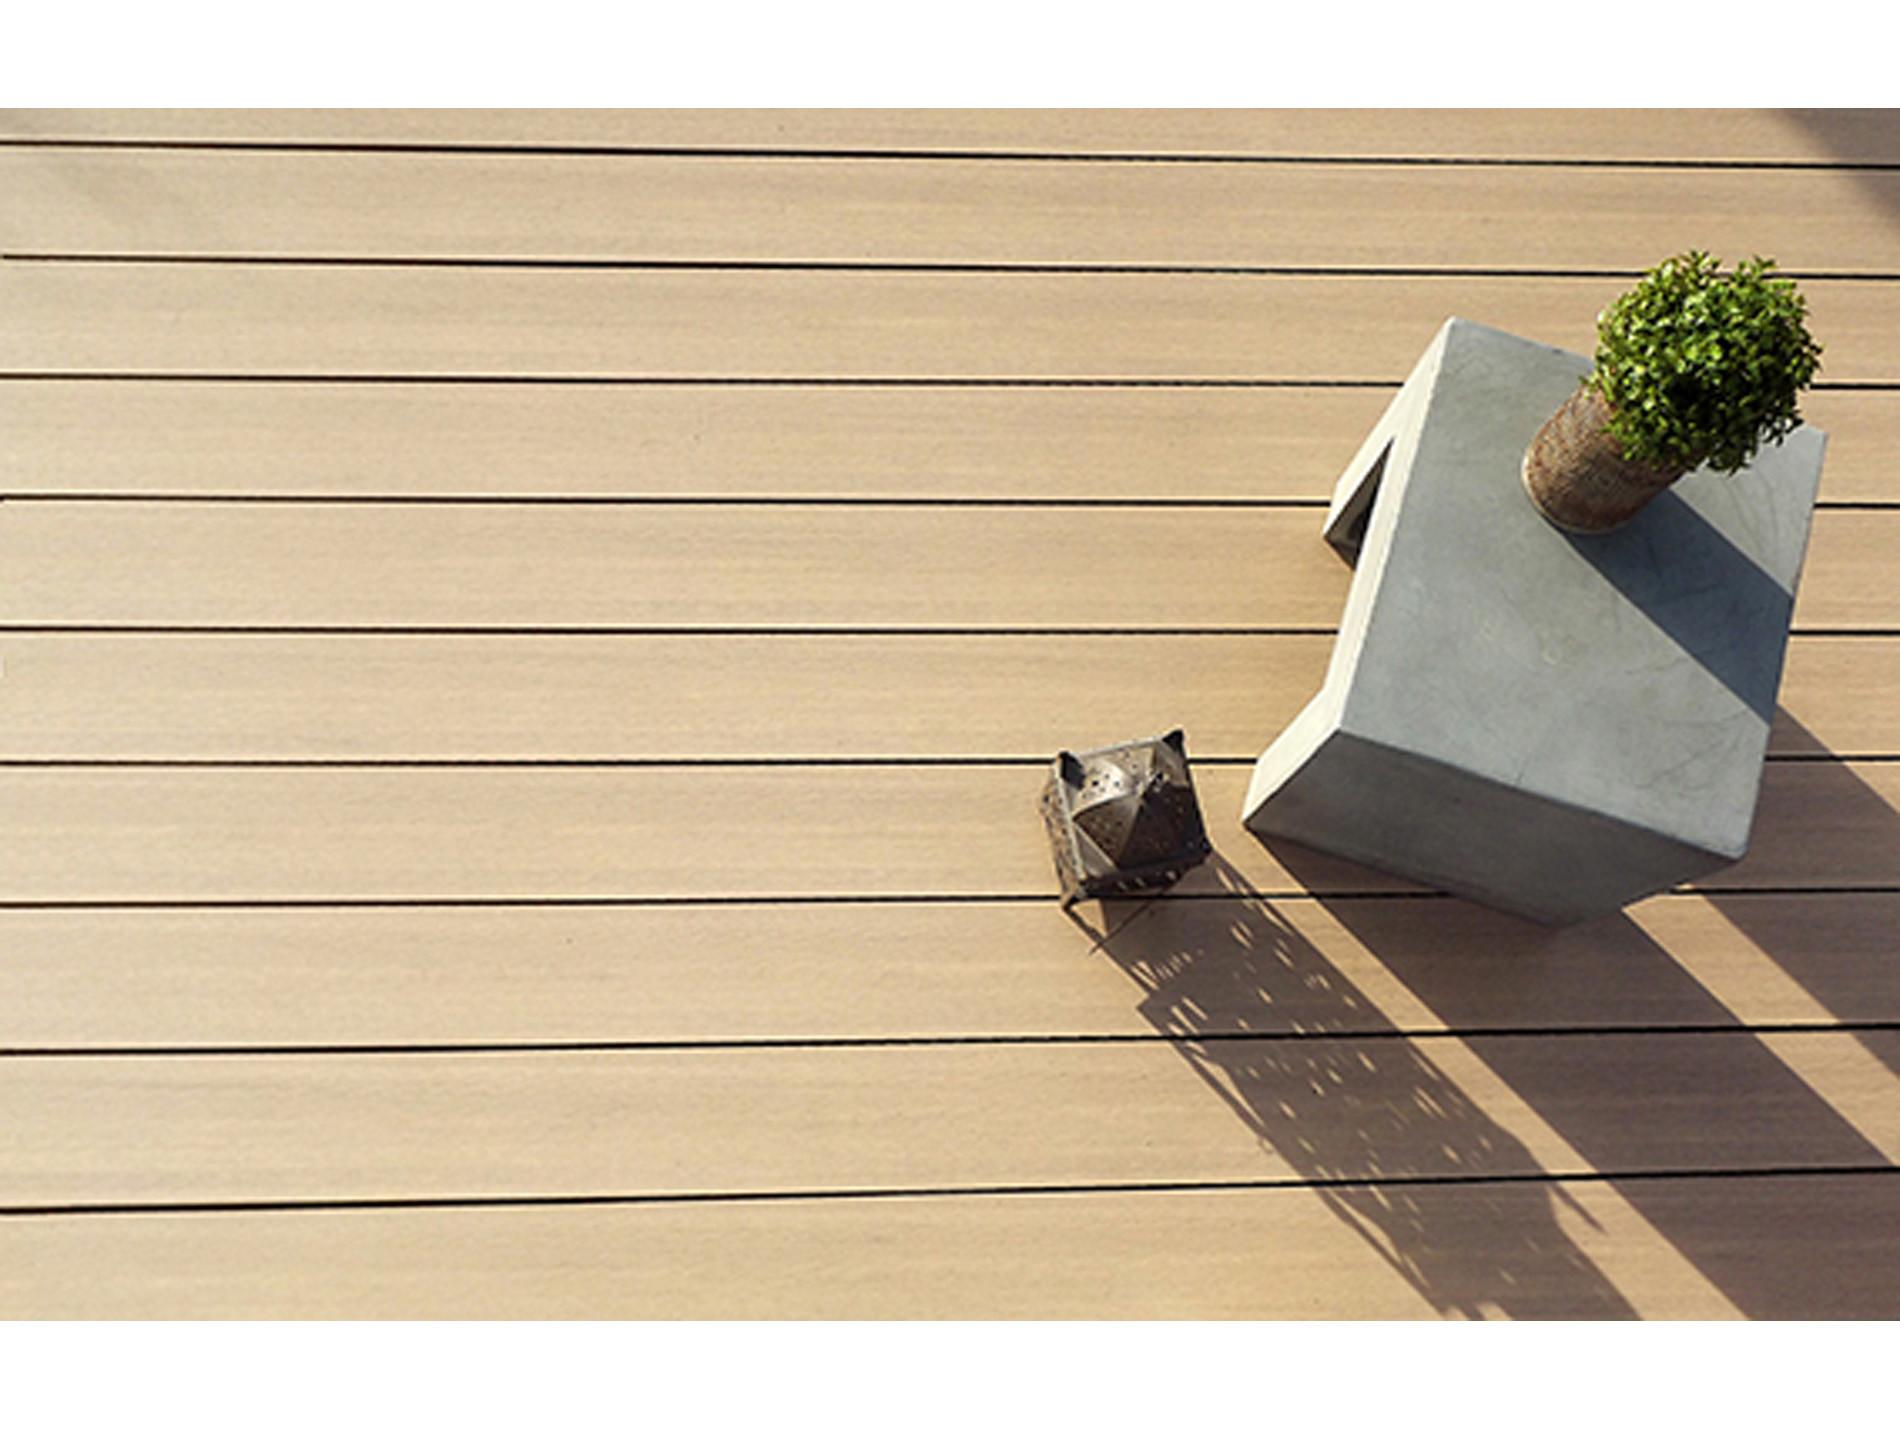 Lame de terrasse CoExtrudée 300x16,1cm